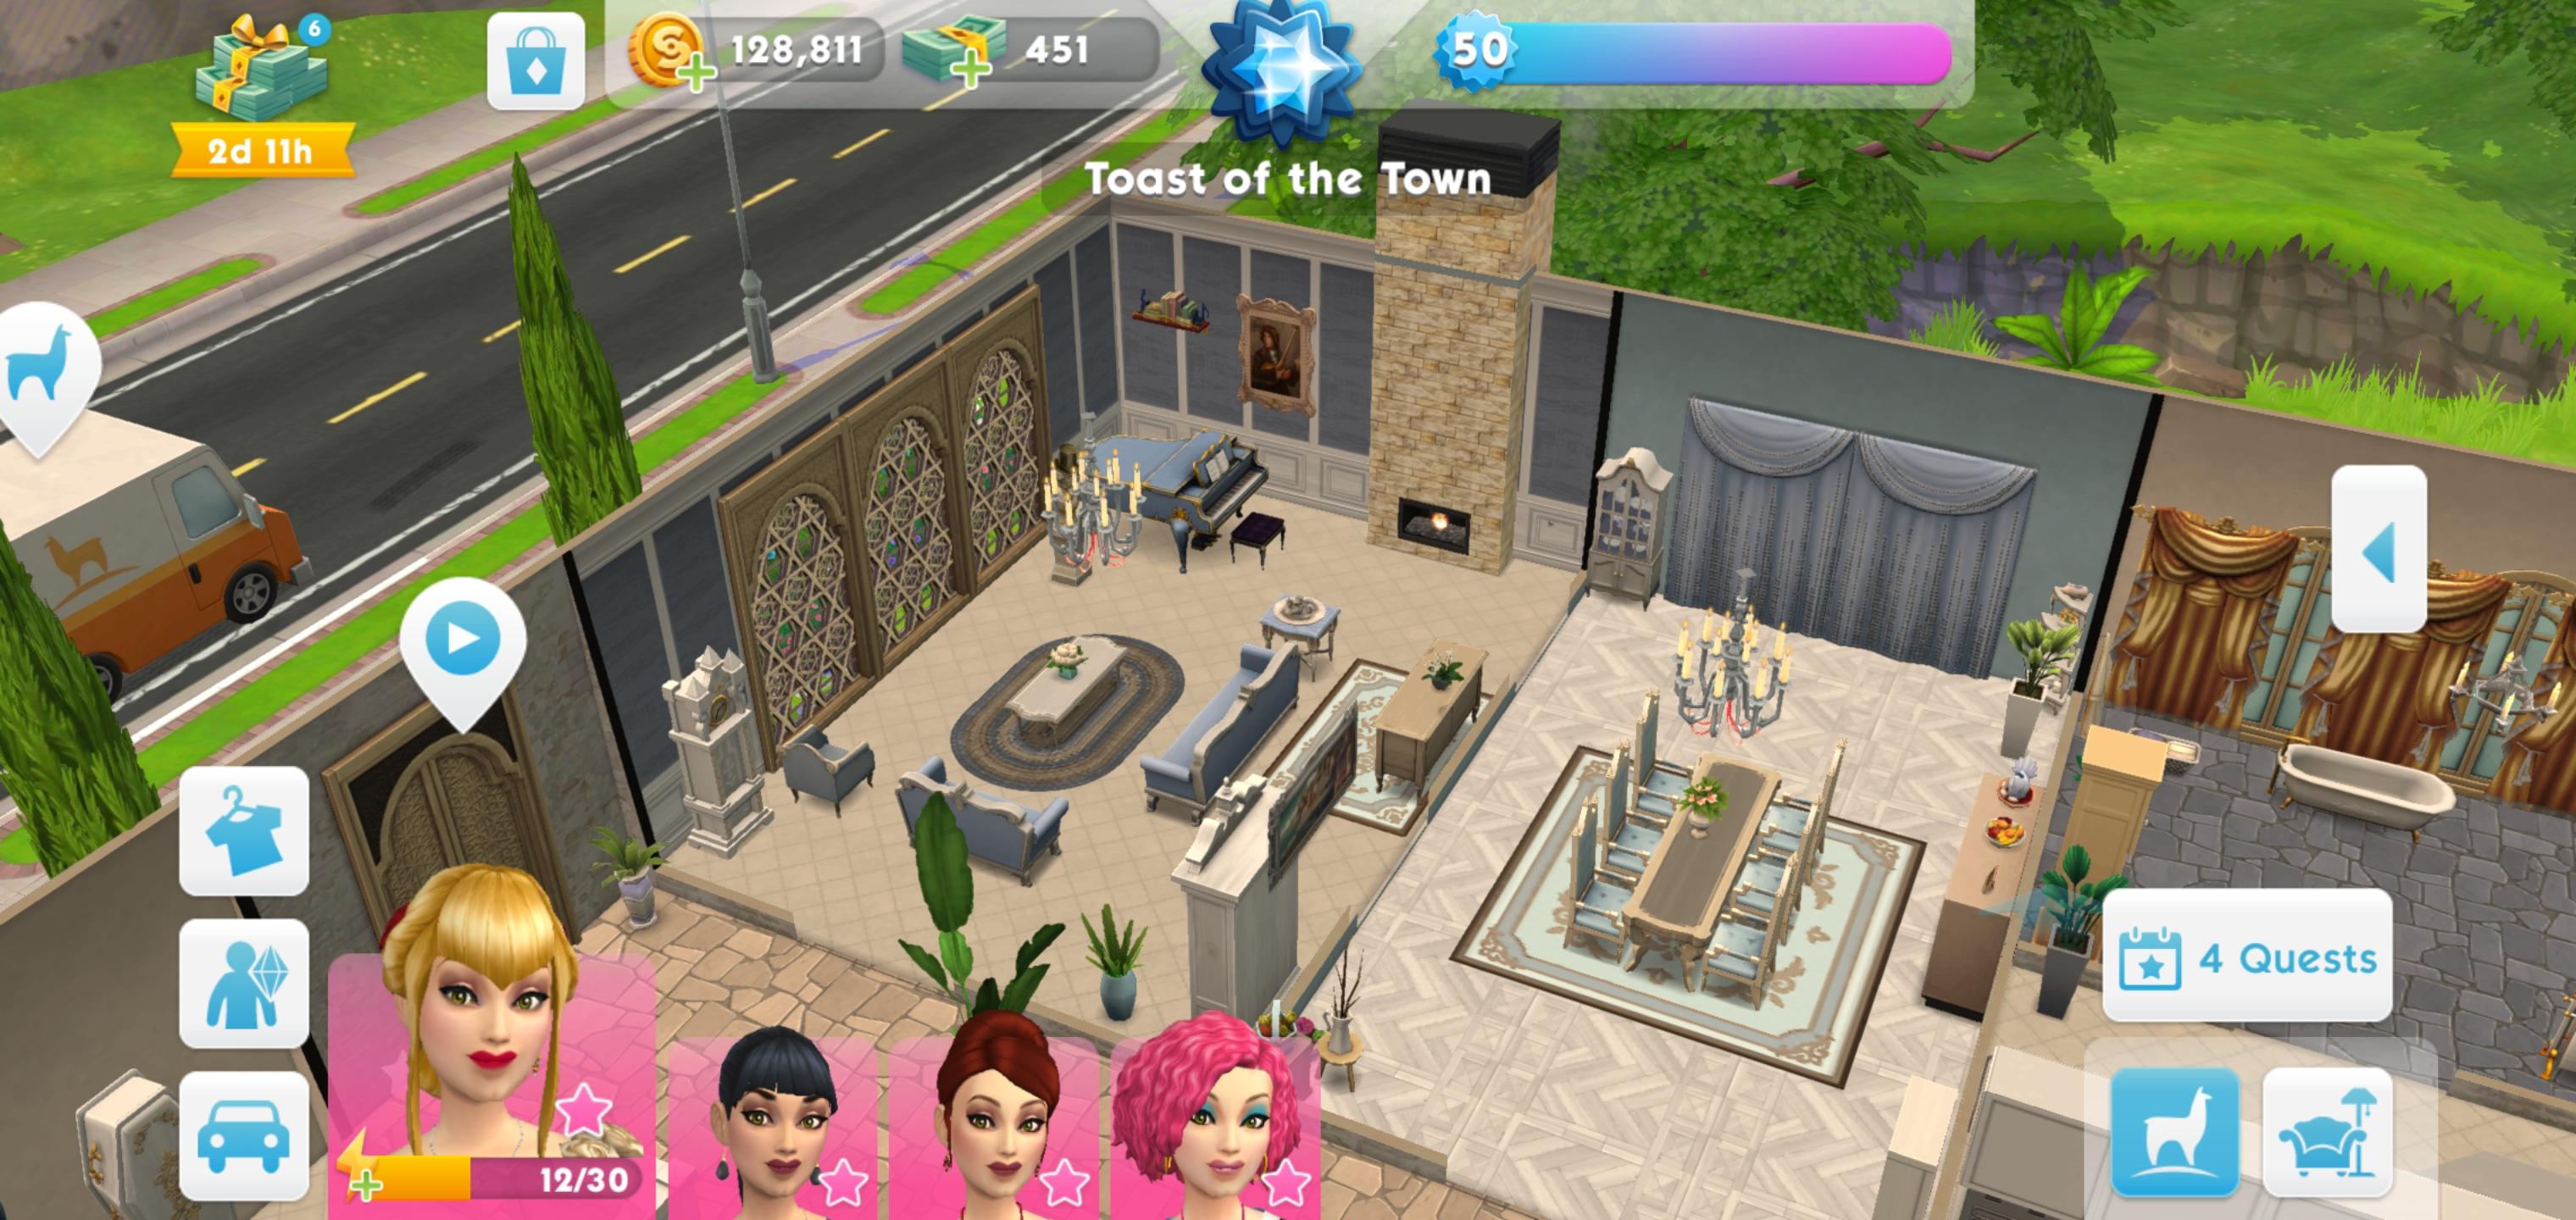 Screenshot_20191204-090002_The Sims.jpg